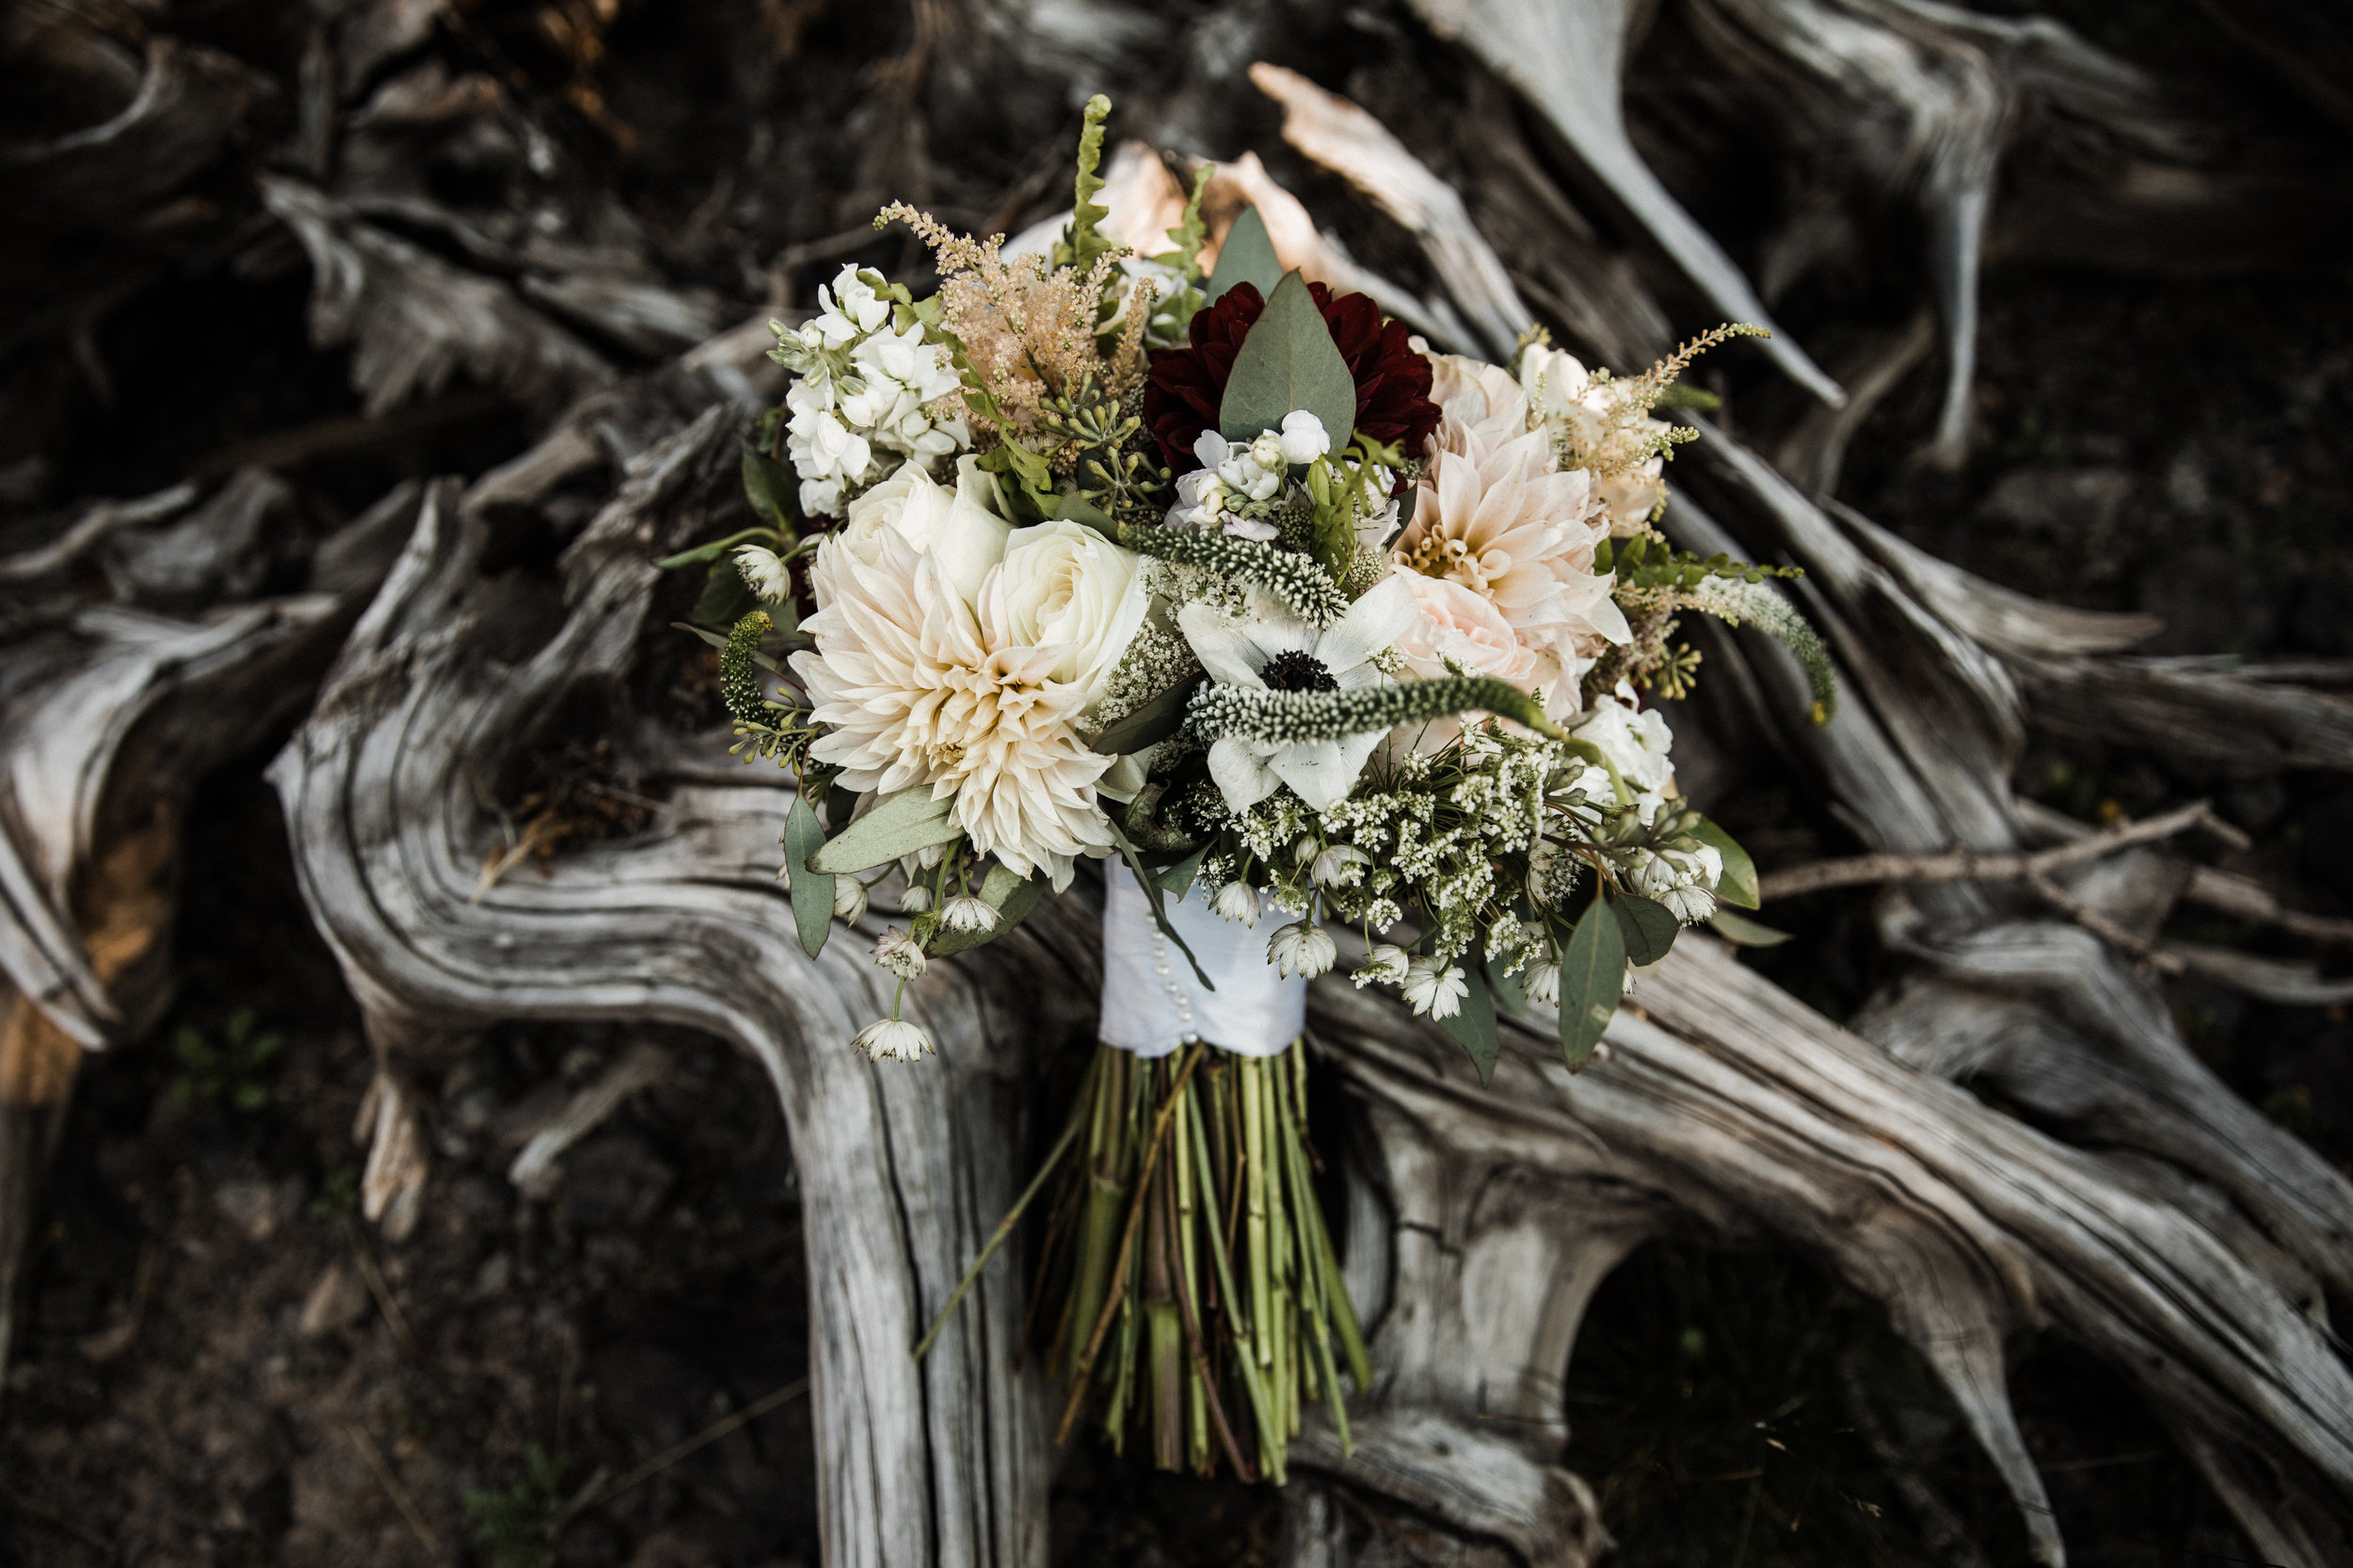 SB-leahandashton-telluride-wedding-photography-0035.jpg